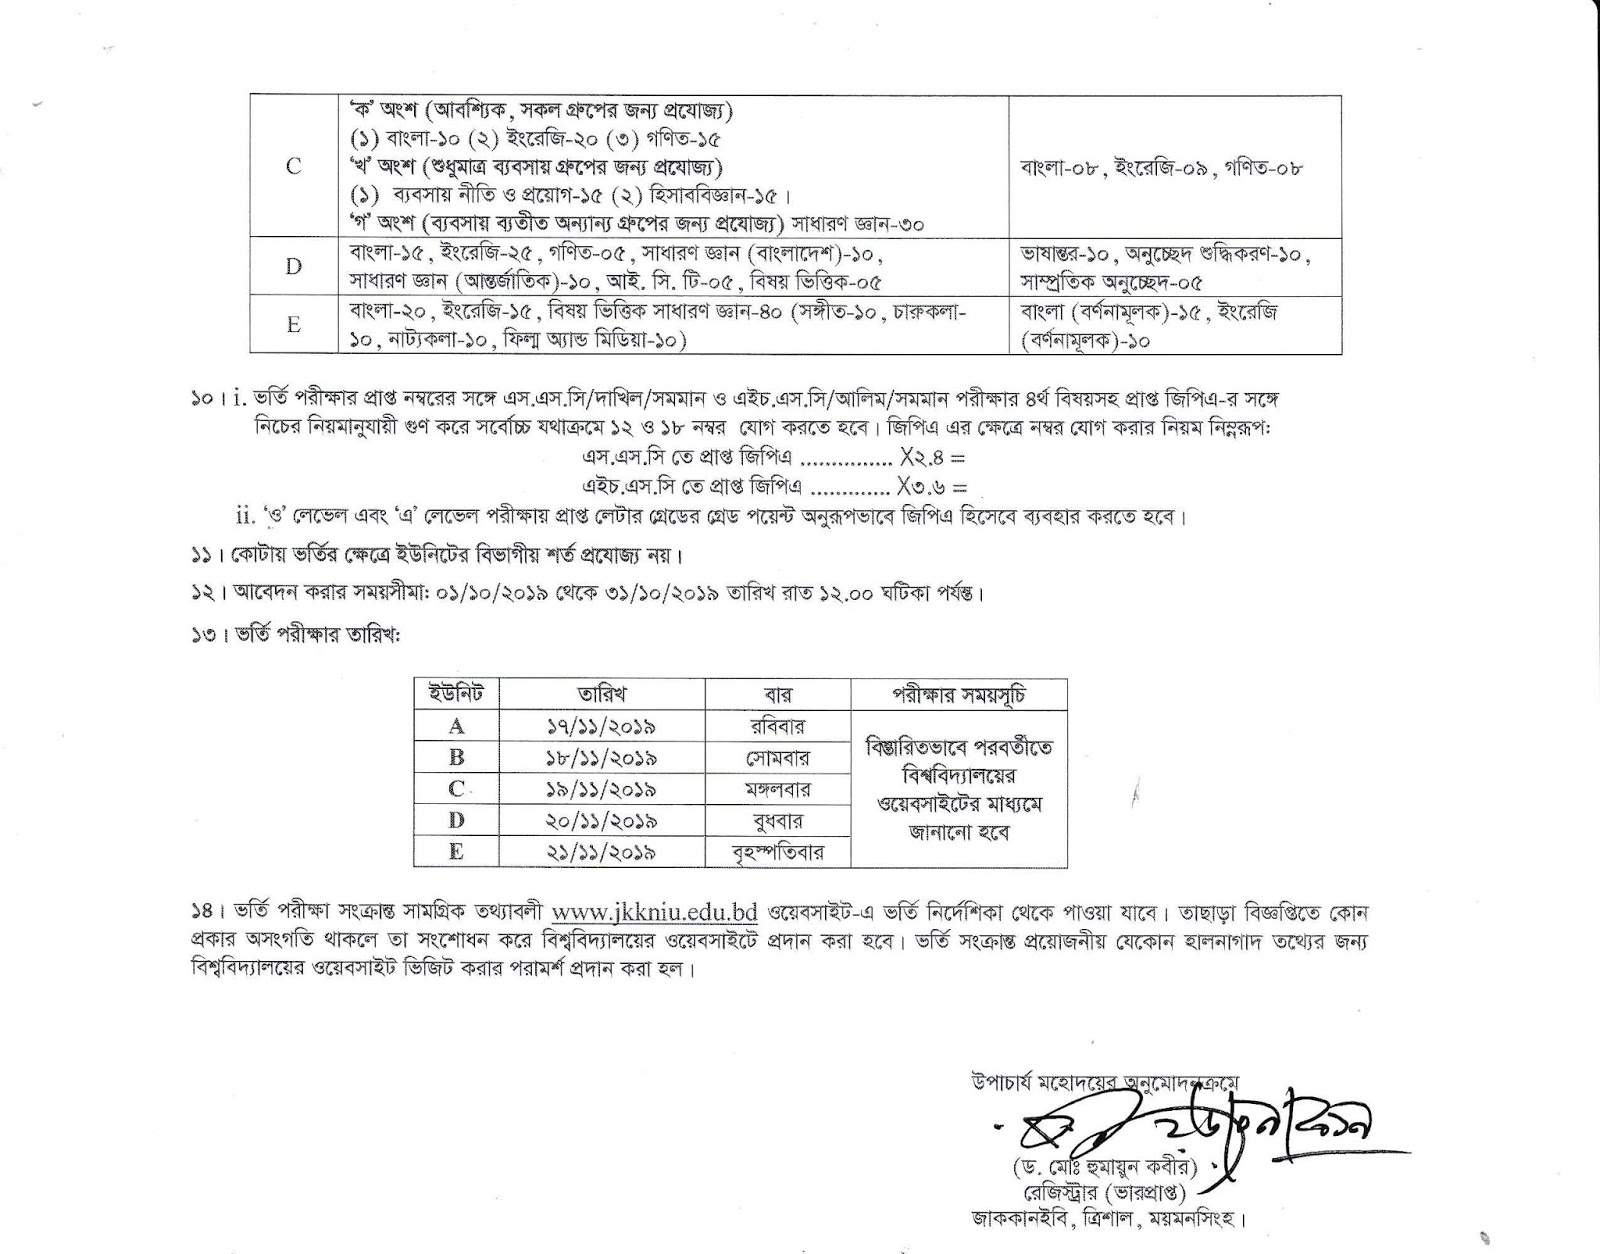 Kazi Nazrul Islam University Admission Circular 2019- 20 Pdf Download